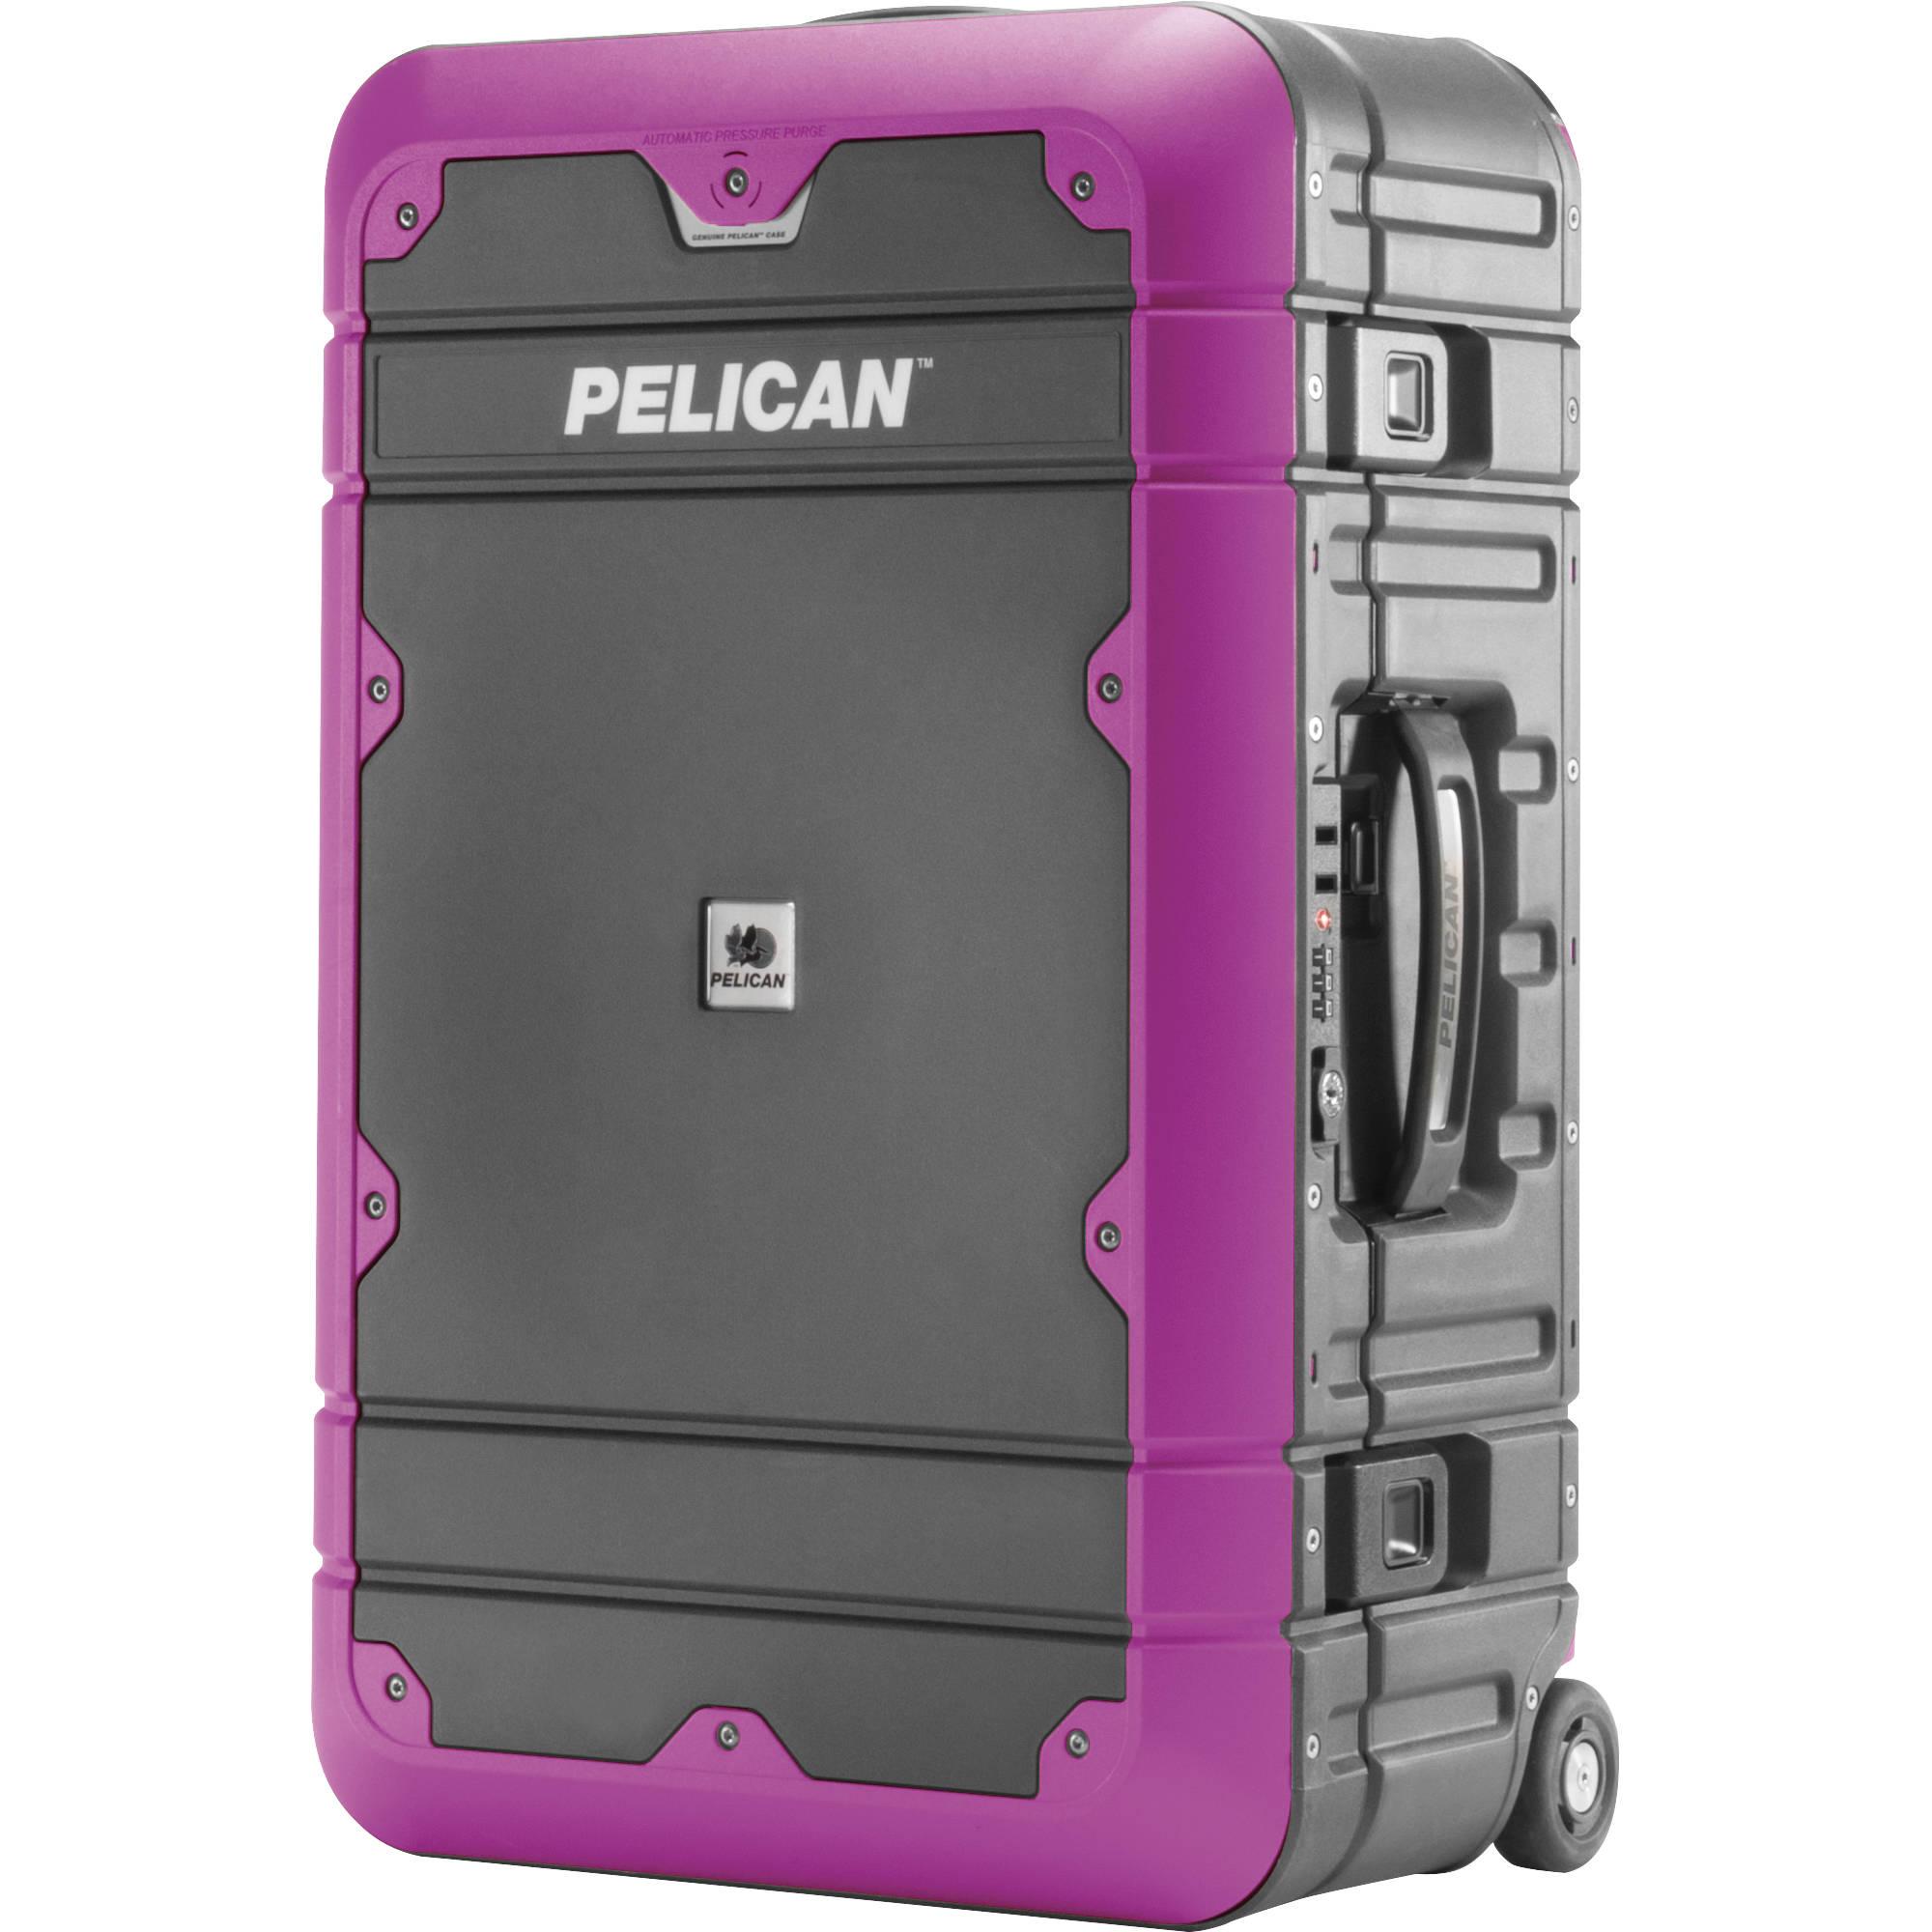 Pelican El22 Elite Carry On Luggage With Enhanced Lg El22 Grypur